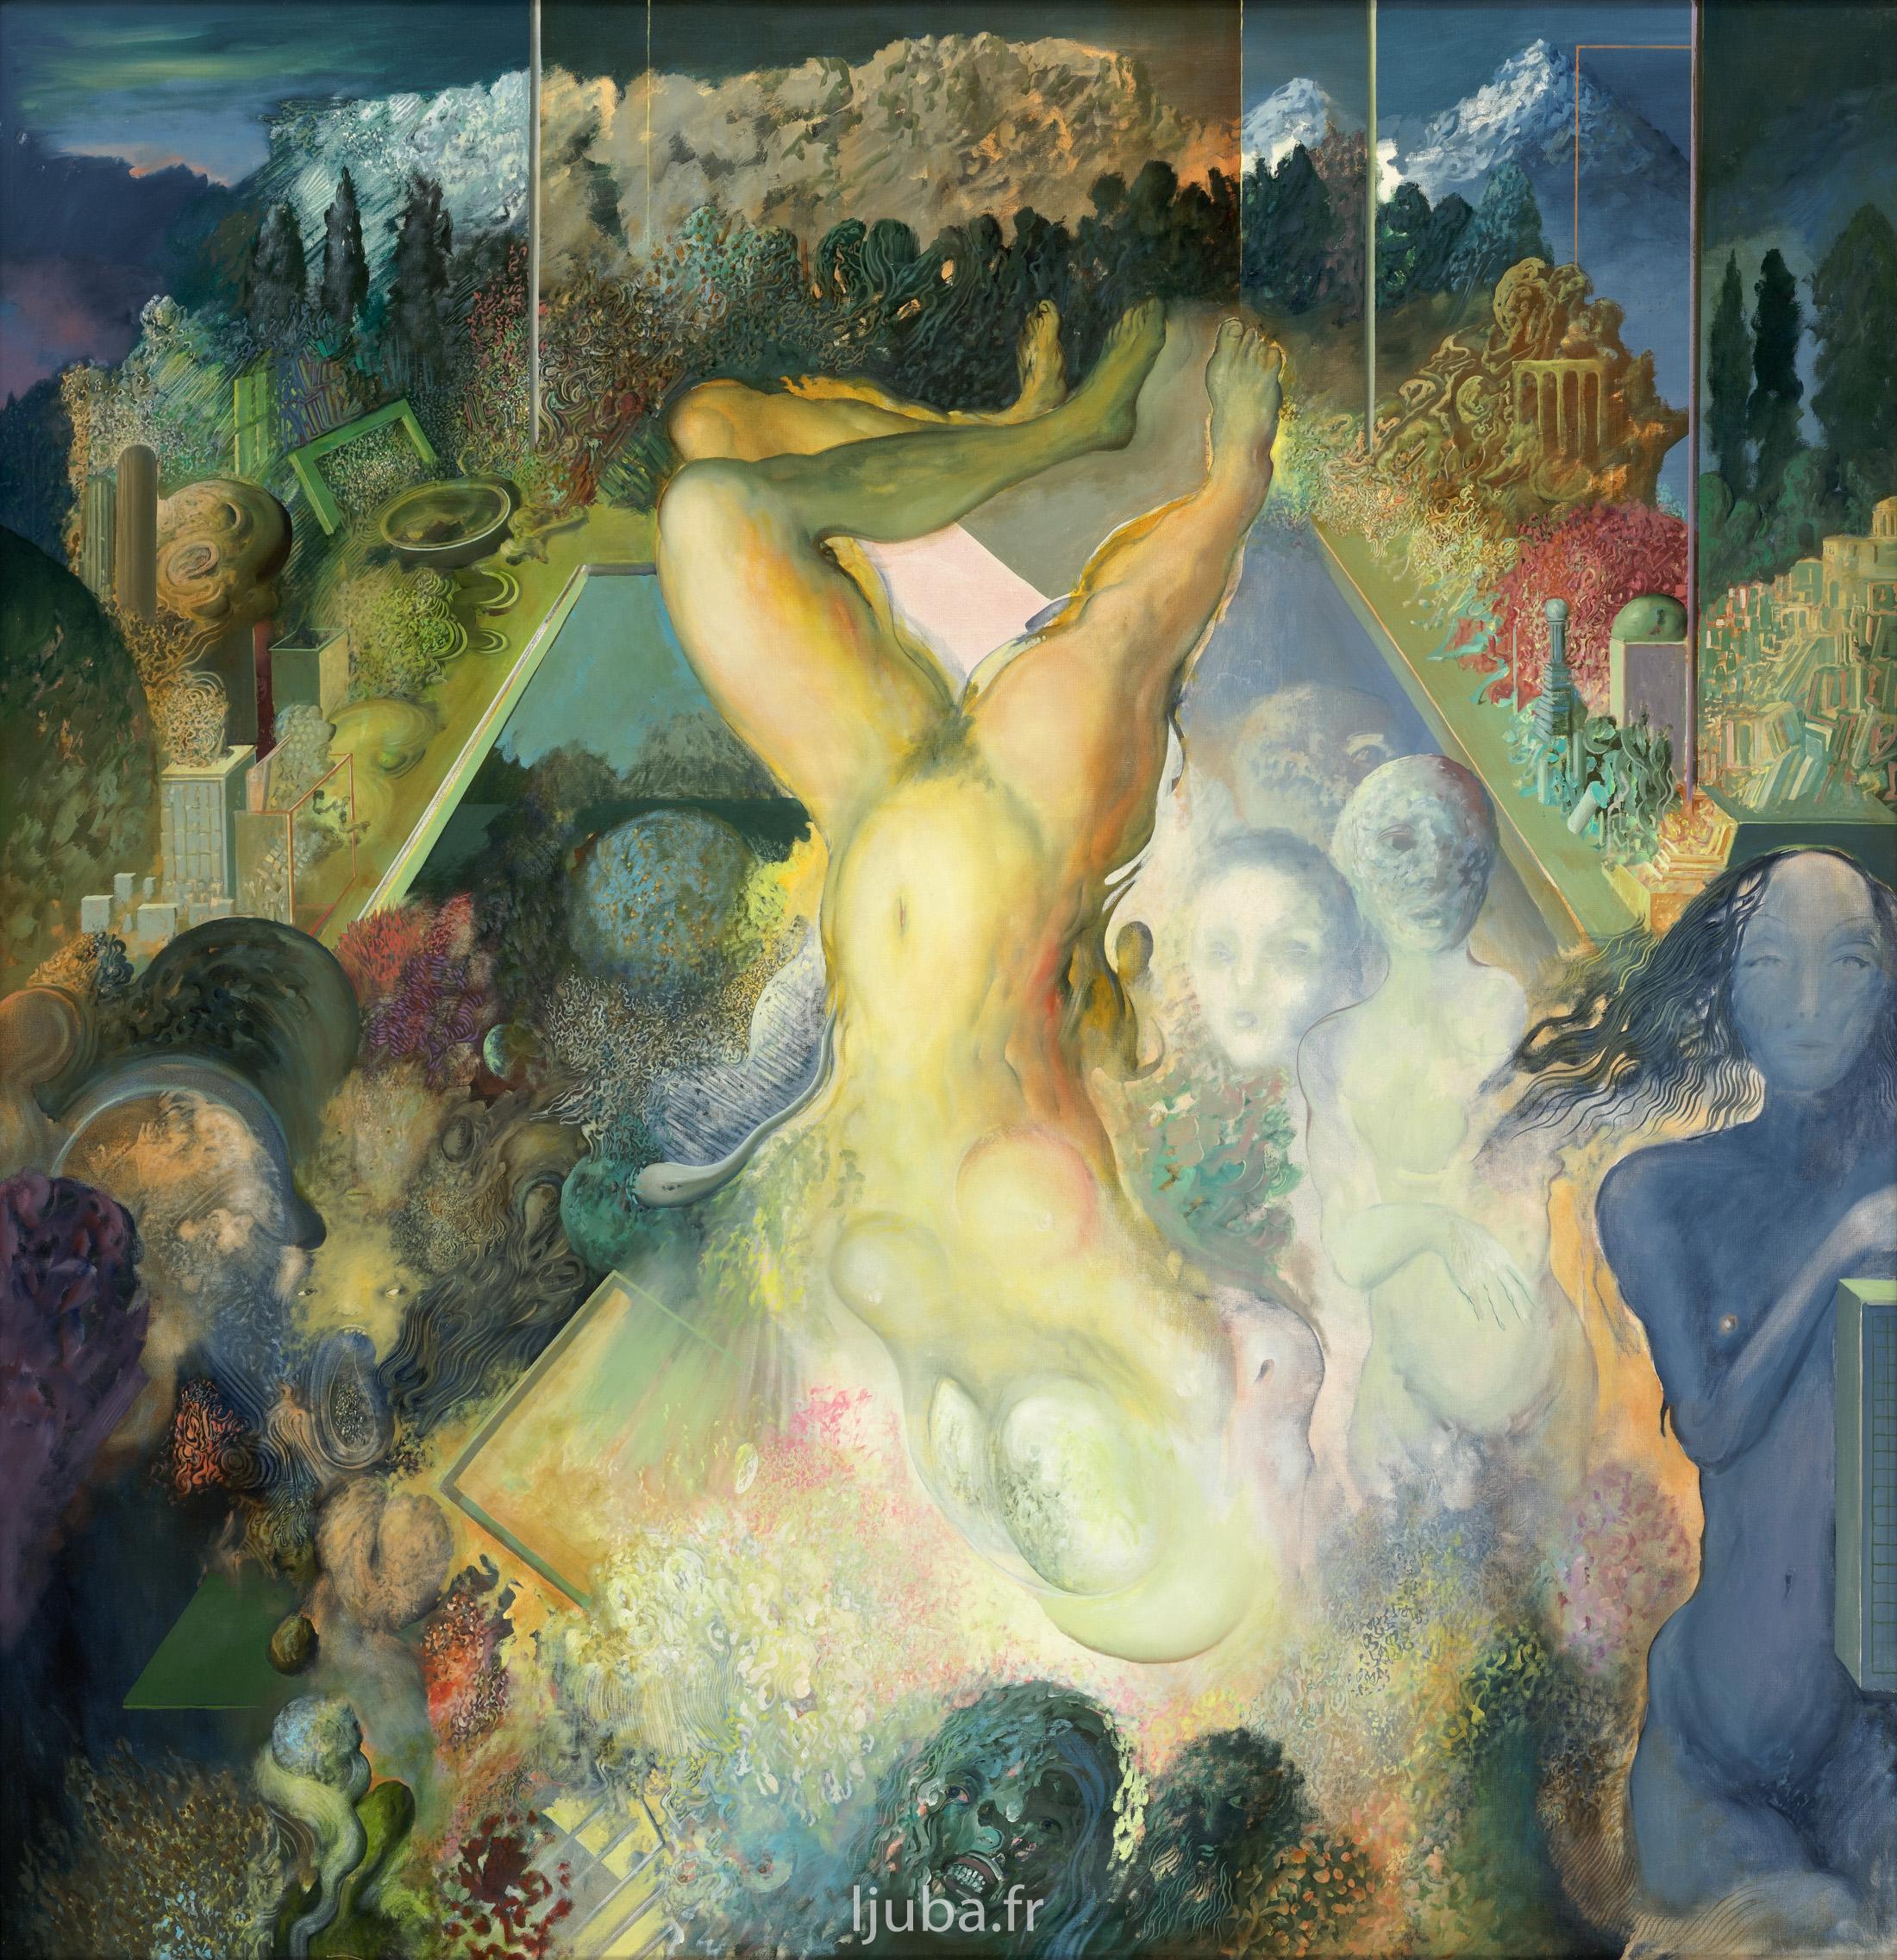 Ljuba Popovic - Le Désir III (Le paradis perdu), 1978